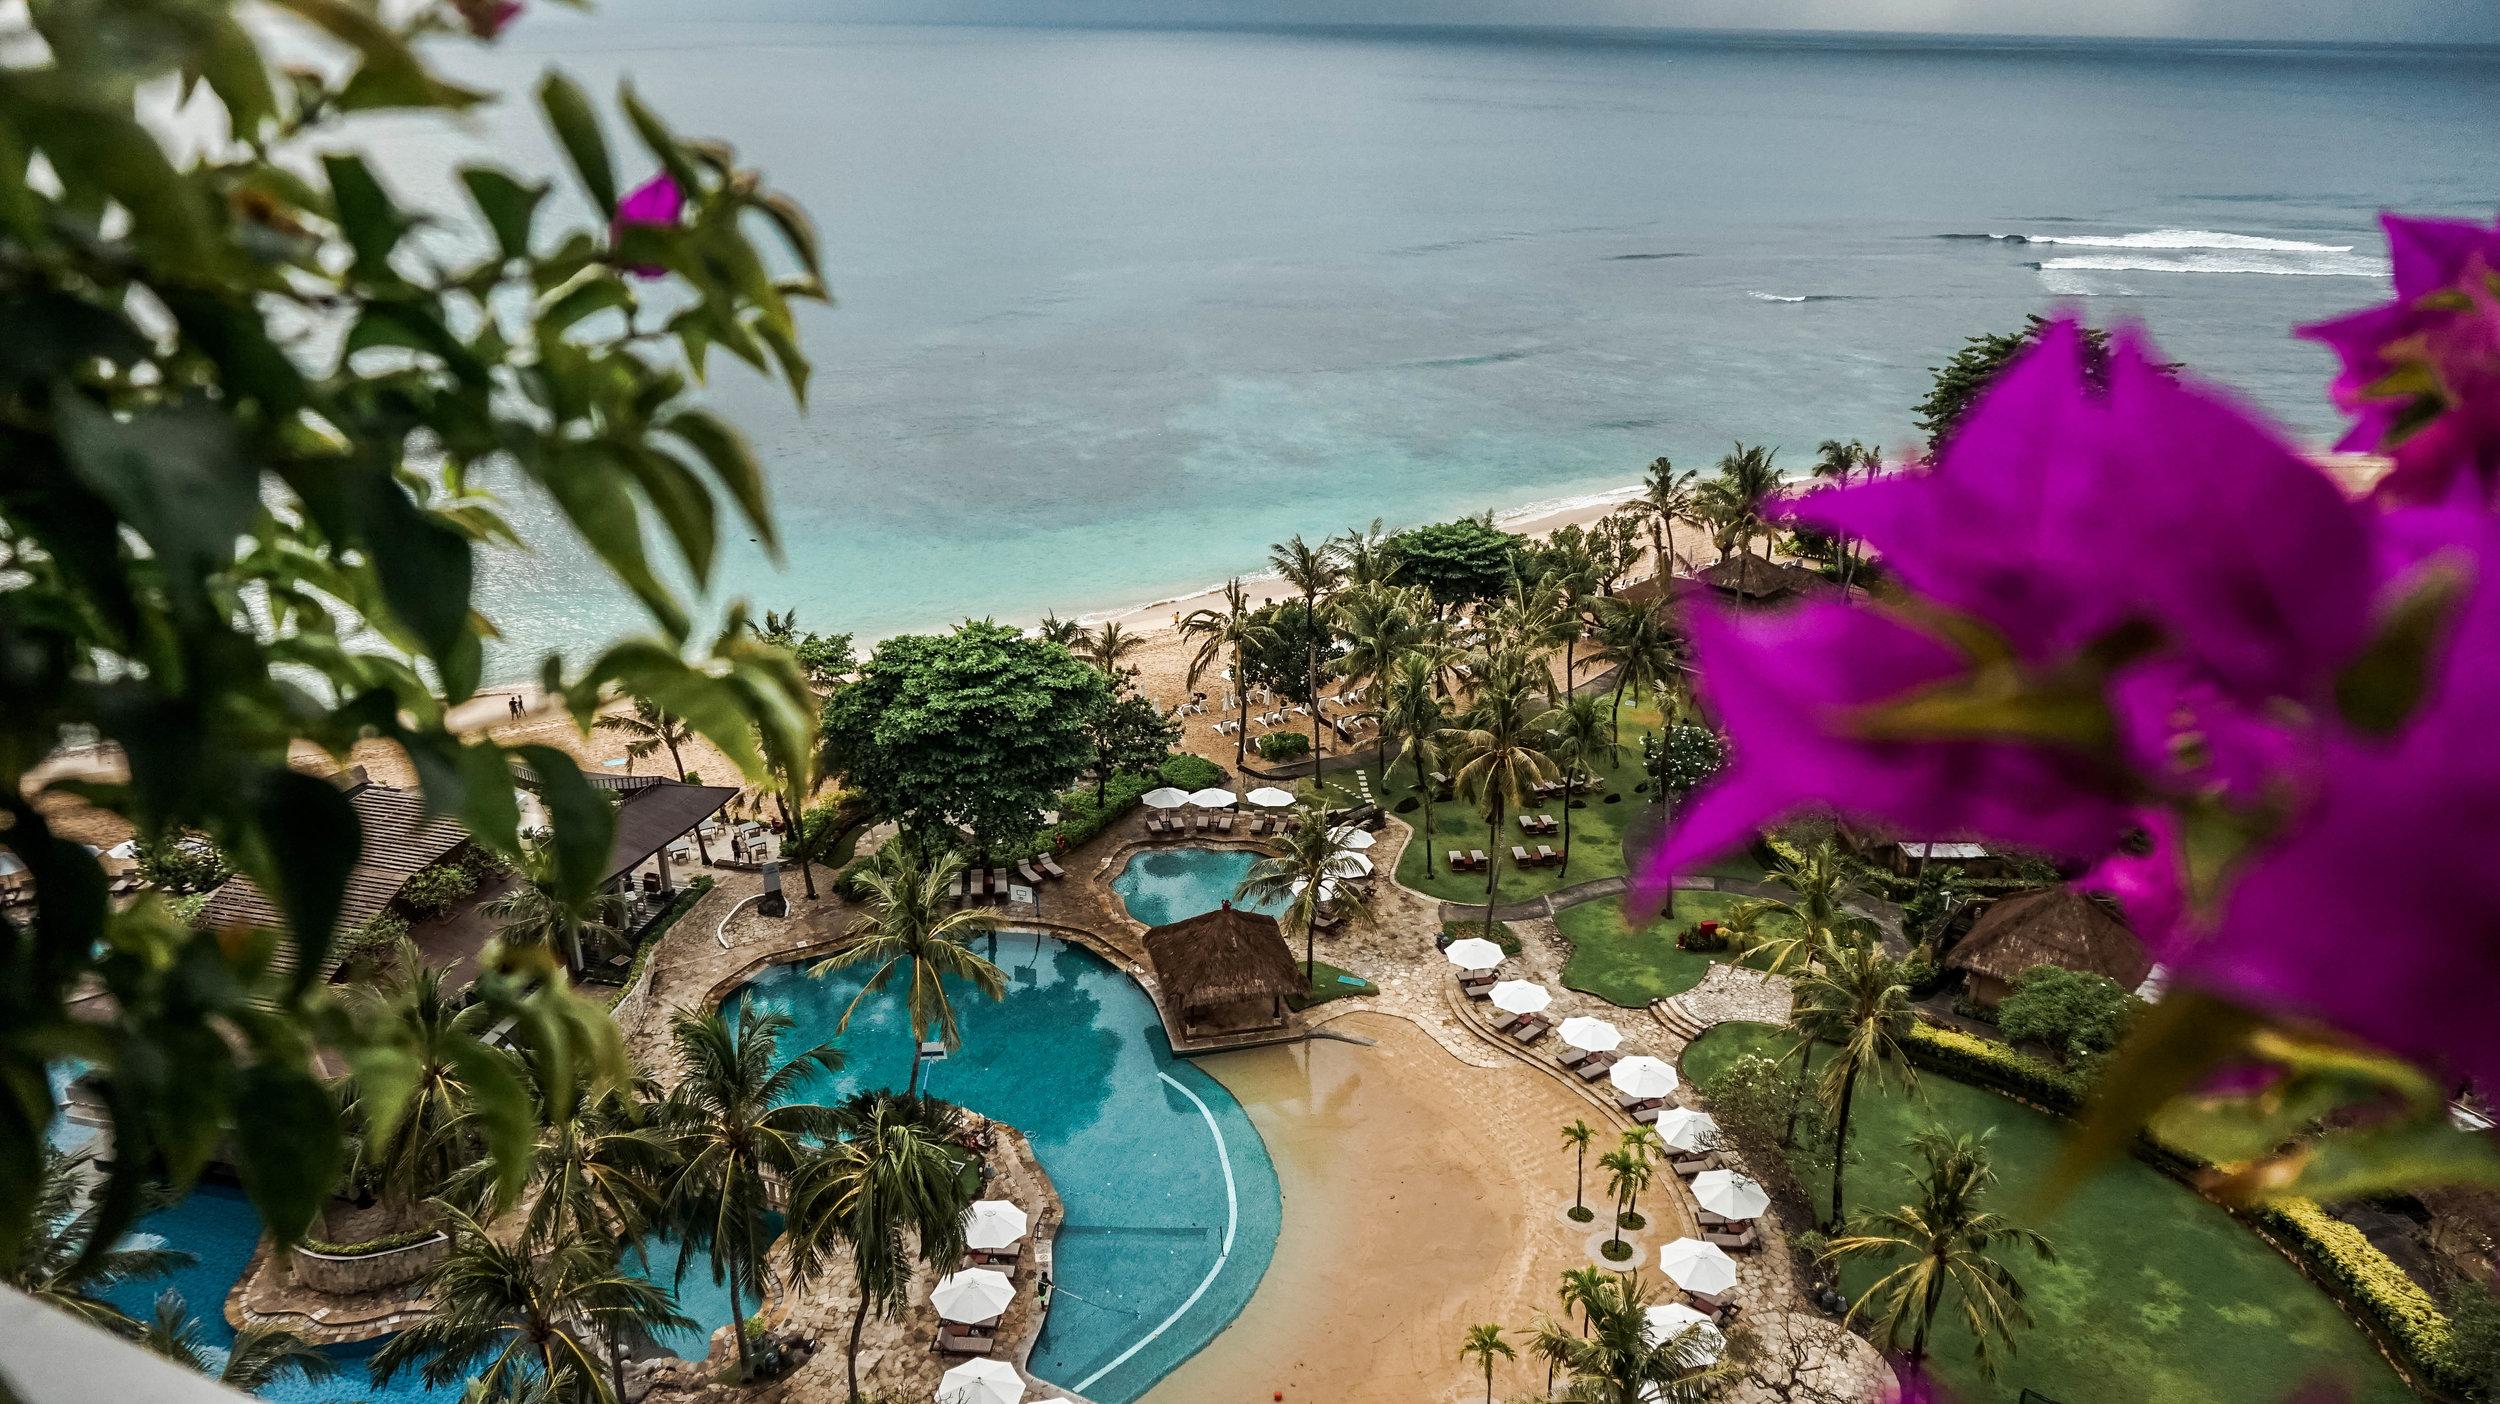 Hilton-bali-resort-beachfront-2018.jpg